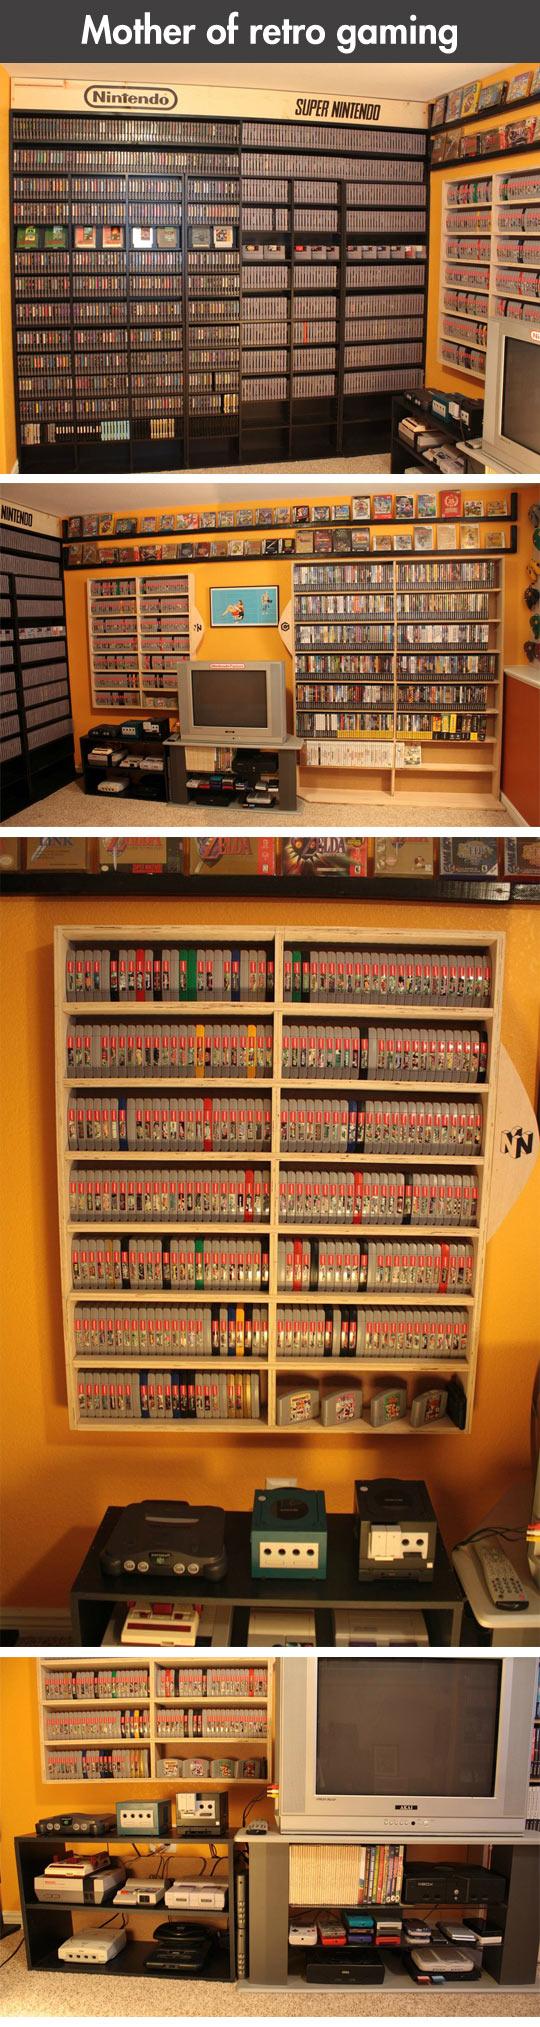 cool-video-game-retro-Nintendo